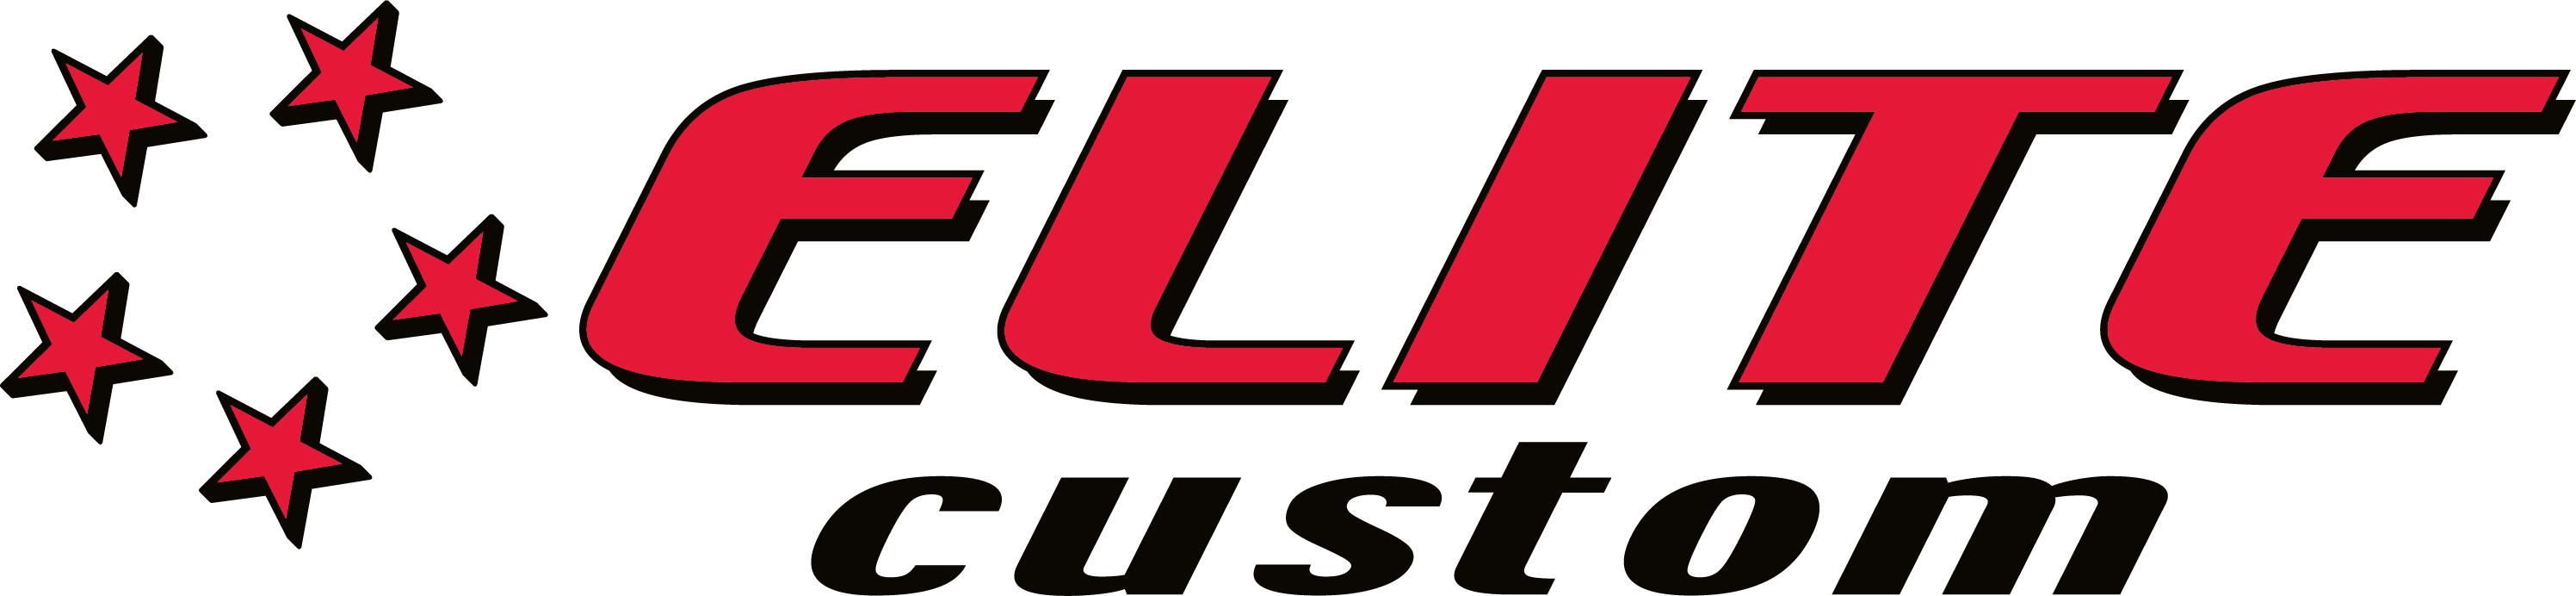 Five Star Bicycles Changes Name To Elite Custom Elite